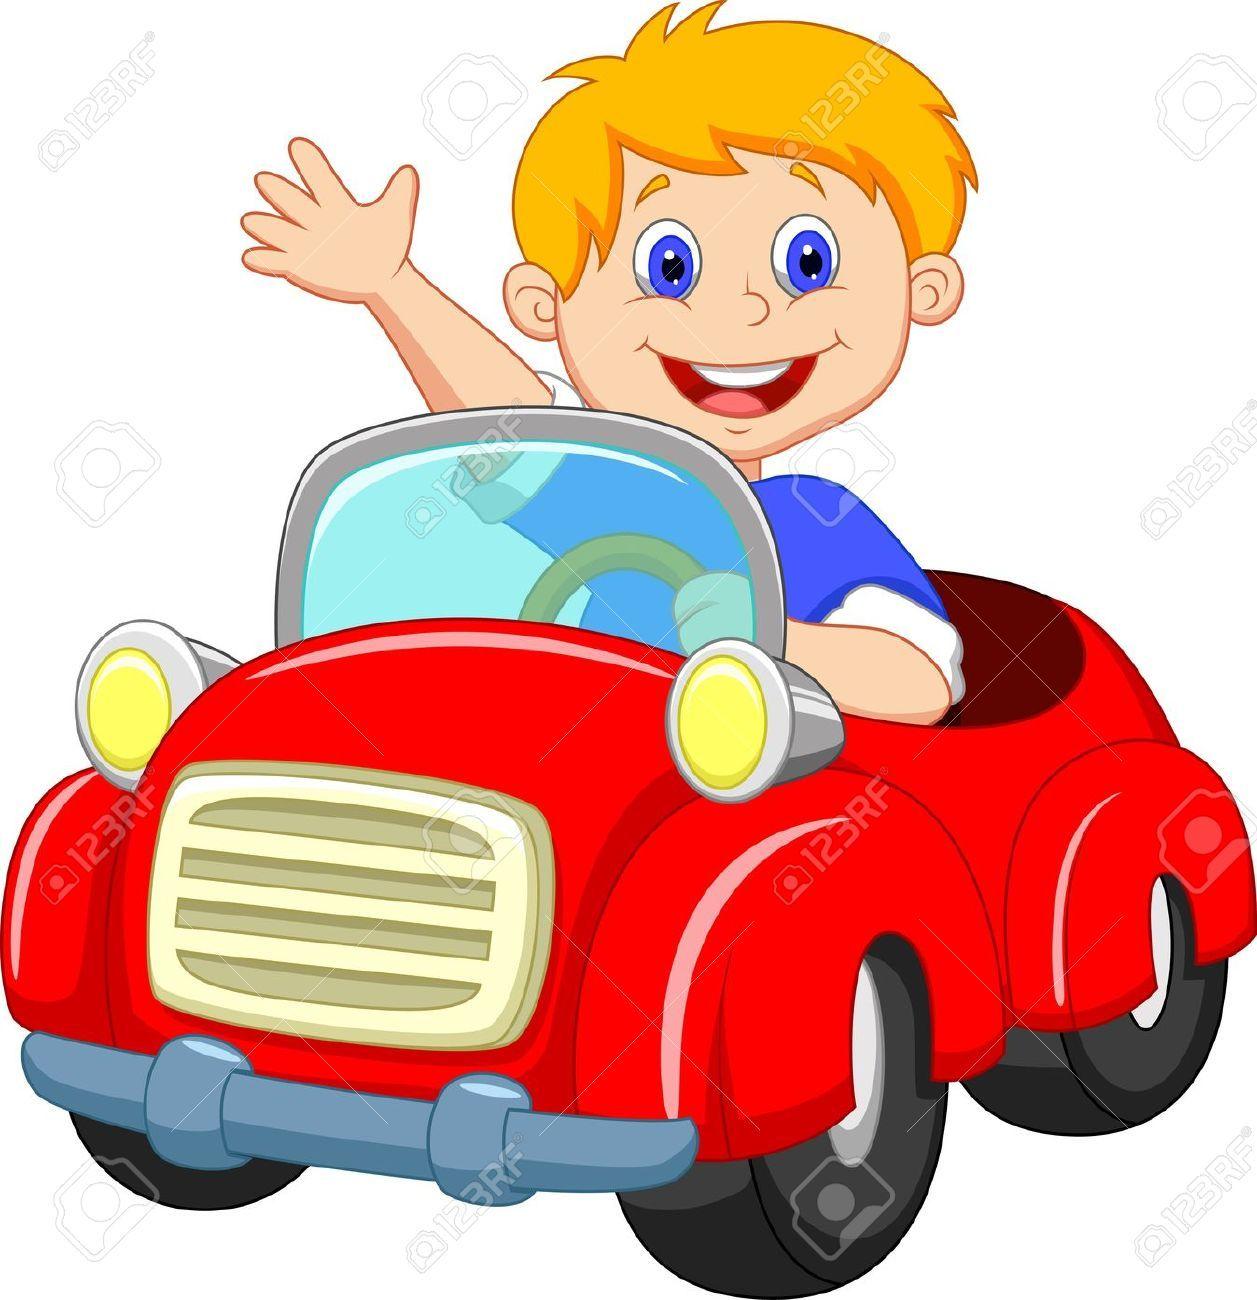 Car driving. Clipart google search driver